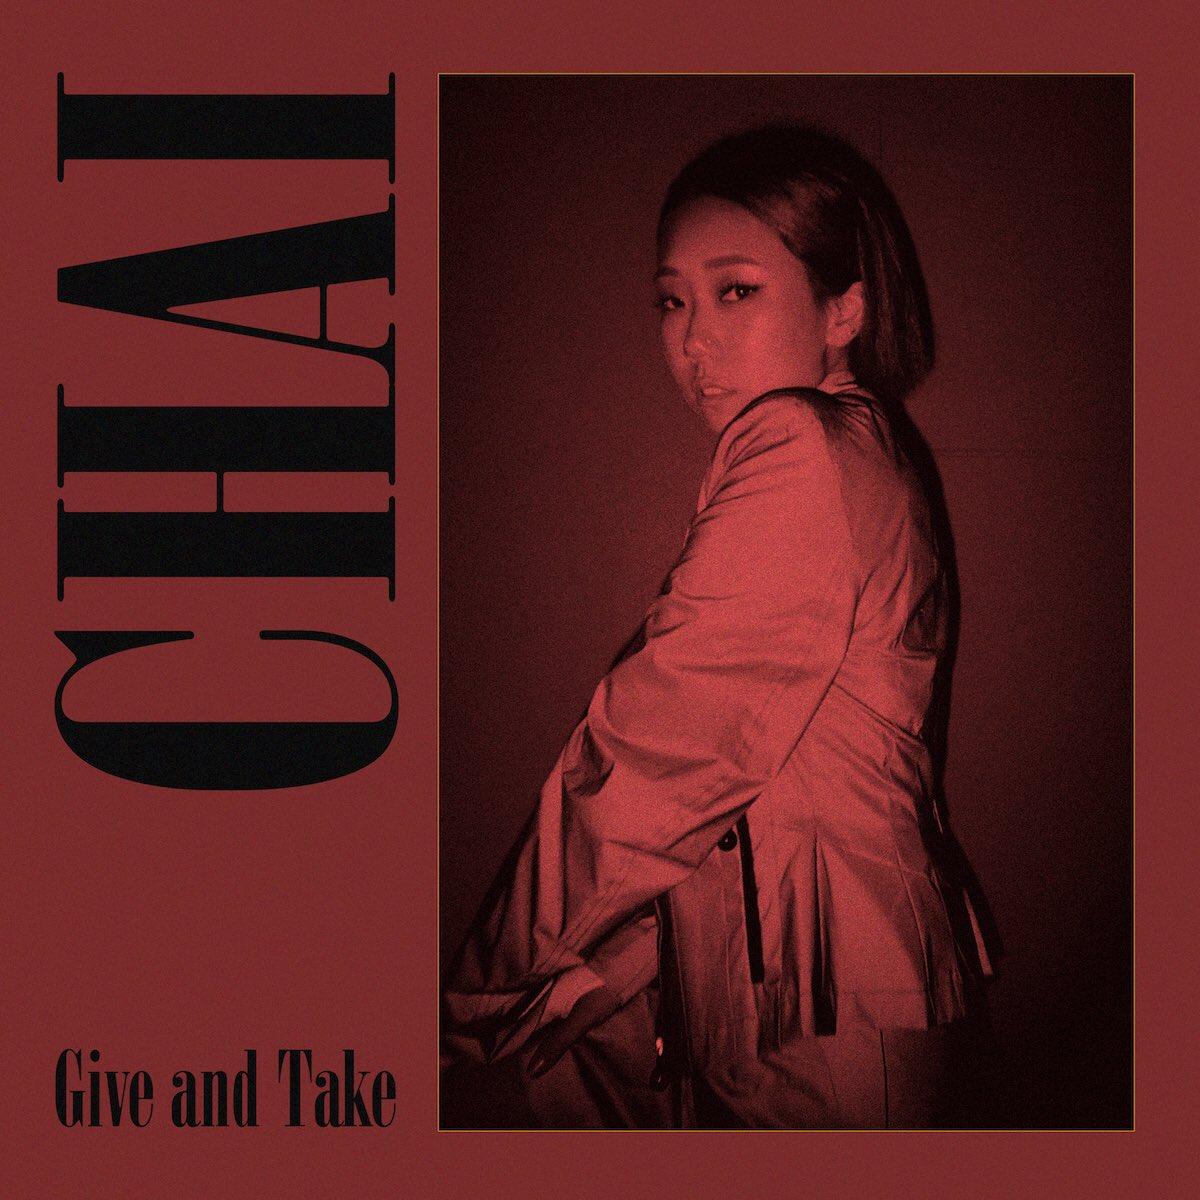 CHAI(이수정) 1st Single 'Give and Take' ㅤ 2019. 6. 19. 6PM release #CHAI #이수정 #GiveandTake